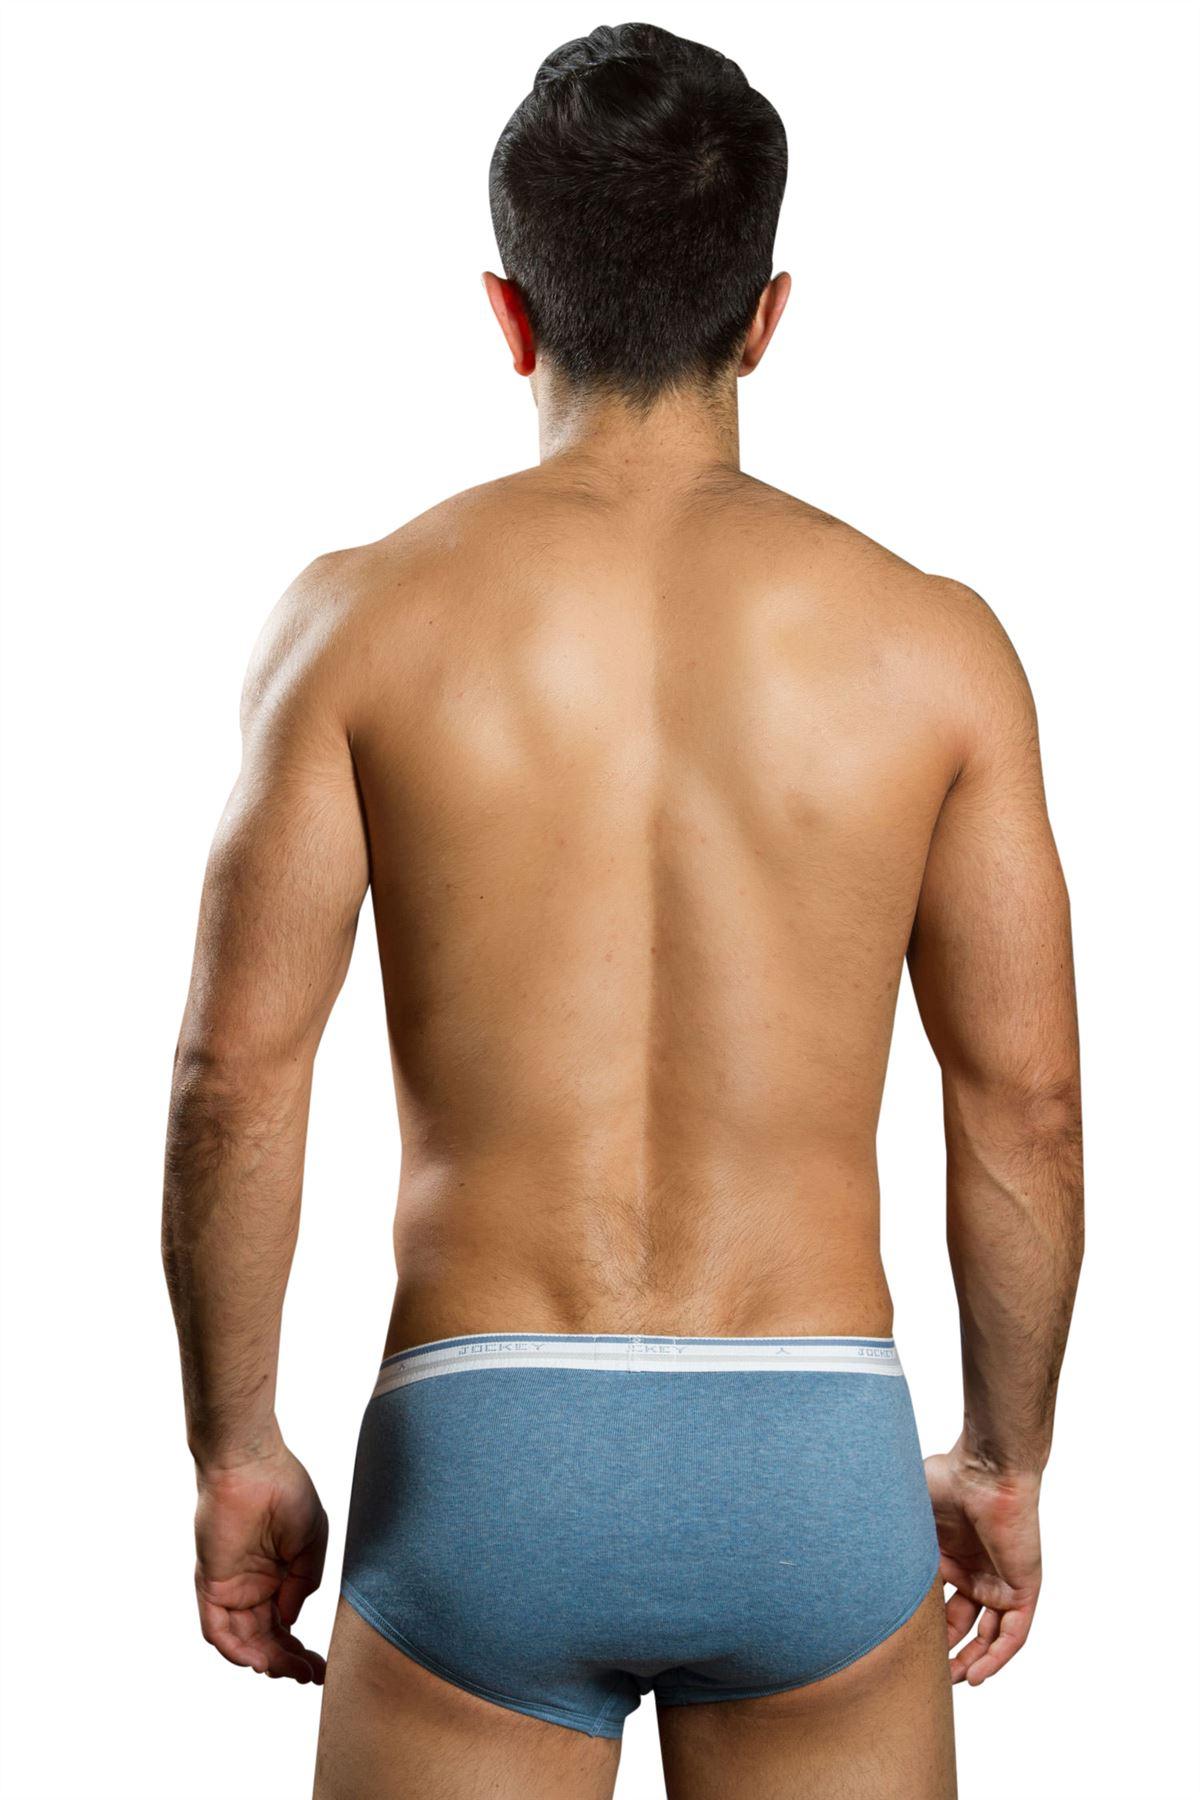 Jockey mens string bikini brief, lindsey lohan sex movie free